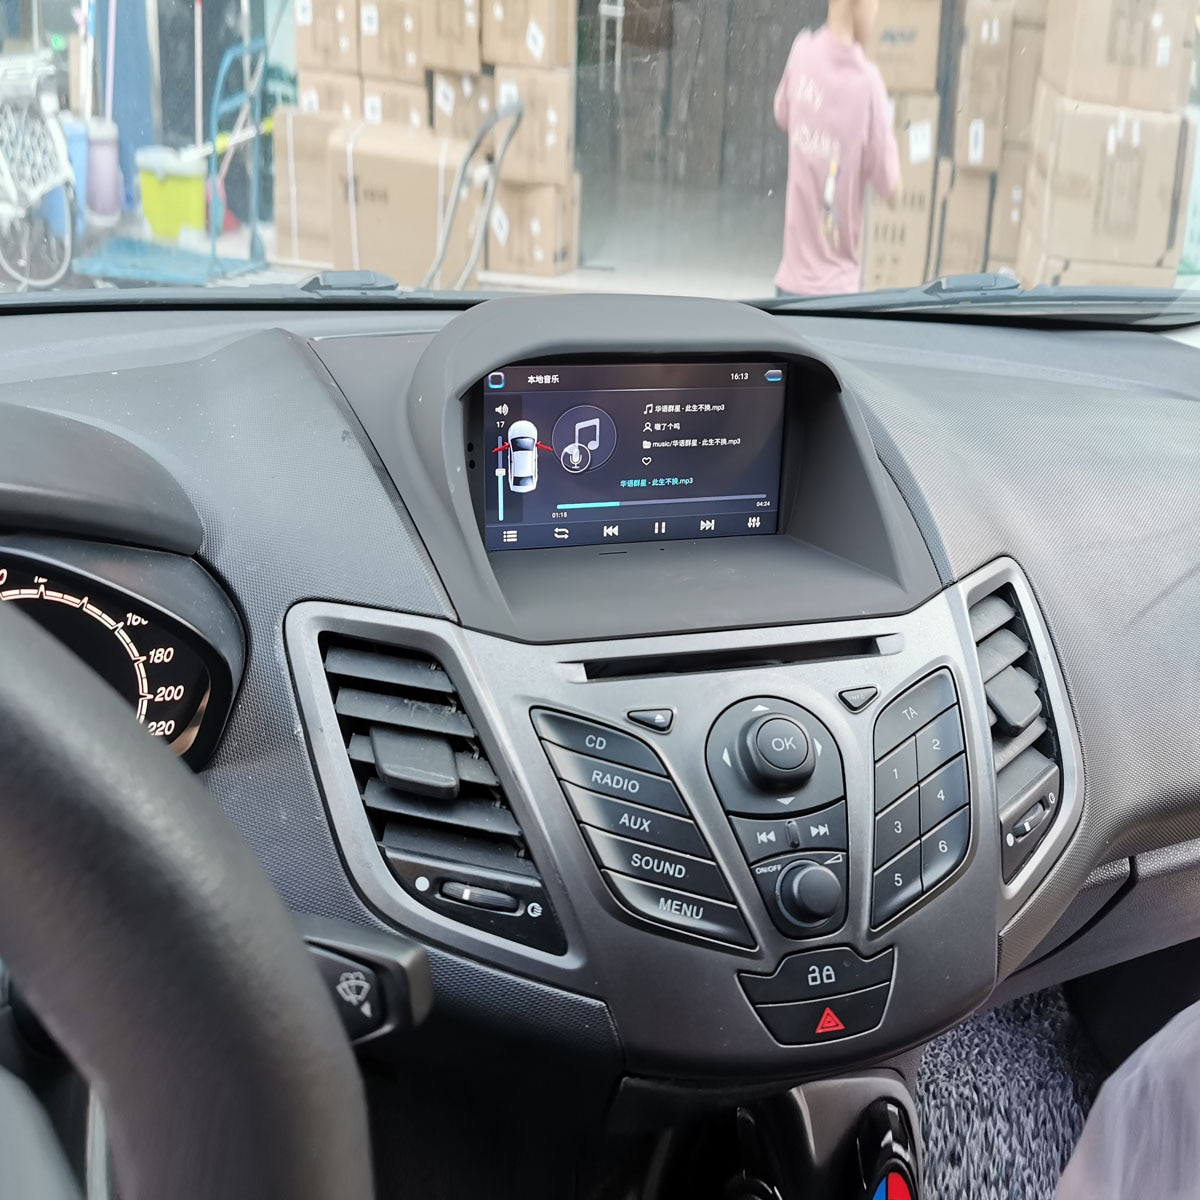 Mlutimedia راديو السيارة الاندورويد تحديد مواقع لمشغل أقراص دي في دي الملاحة لفورد فييستا 2008-2013 راديو السيارة مشغل فيديو الوسائط المتعددة